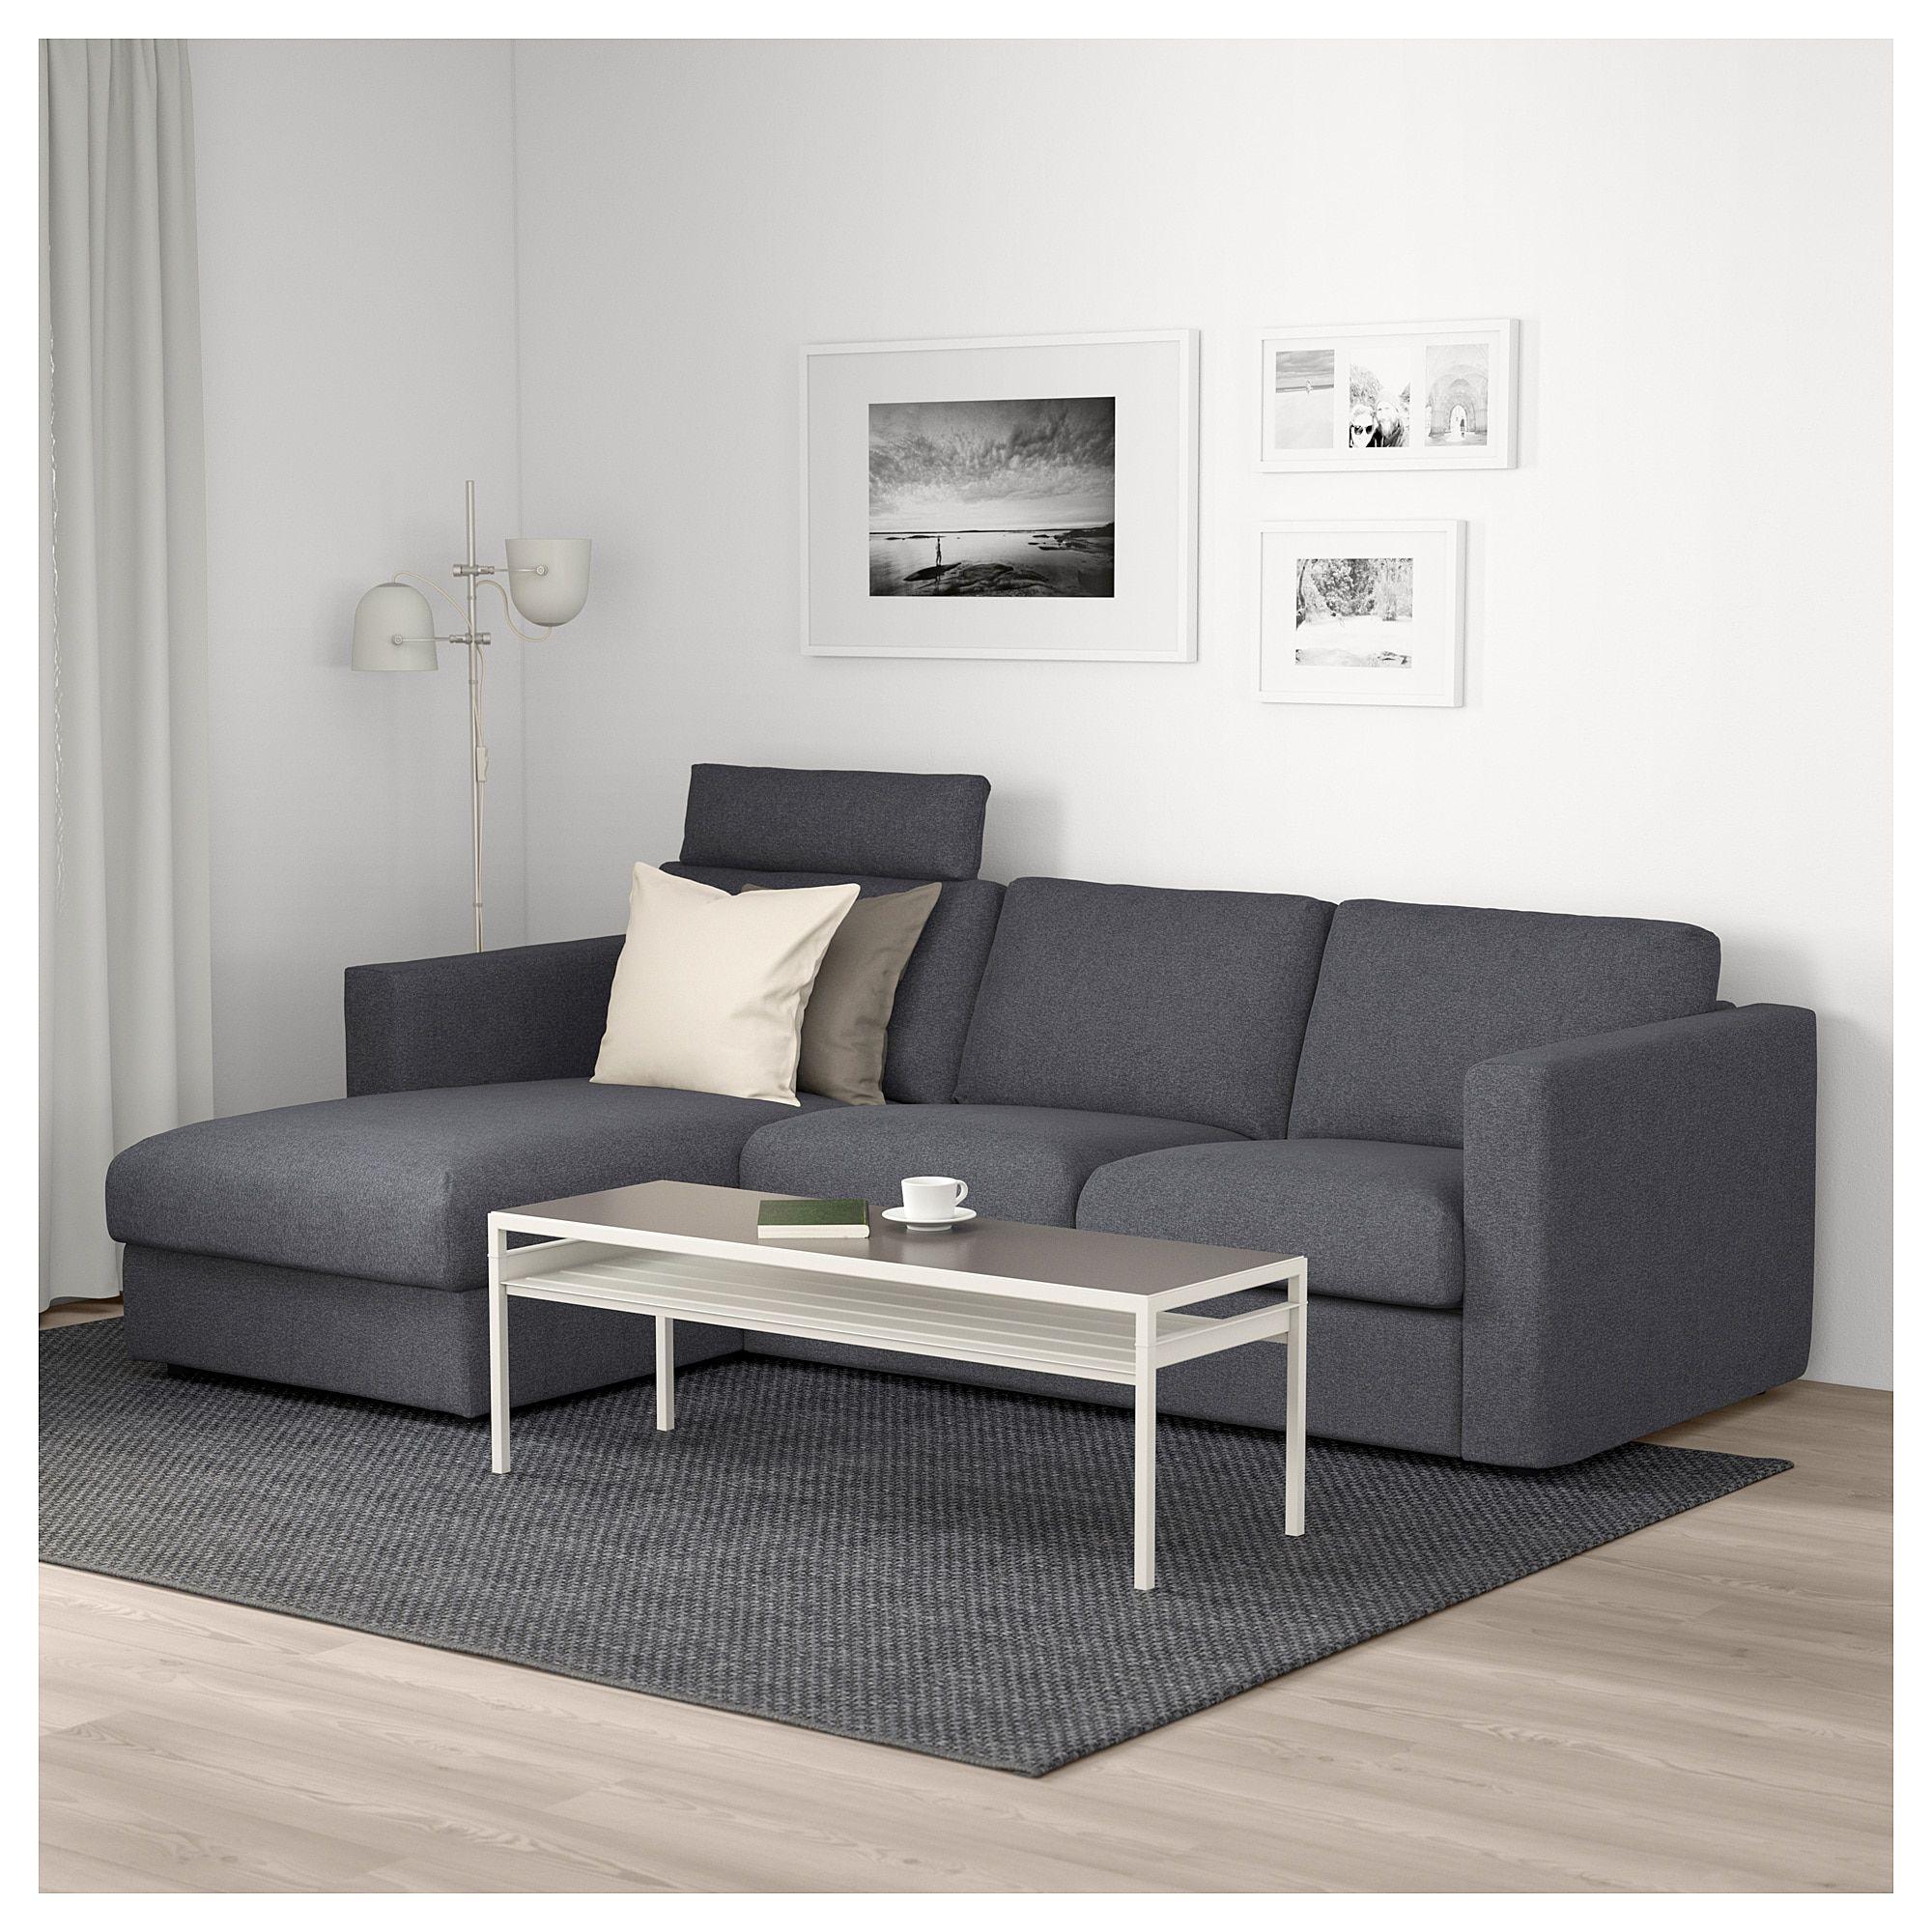 IKEA US Furniture and Home Furnishings   Three seat sofa